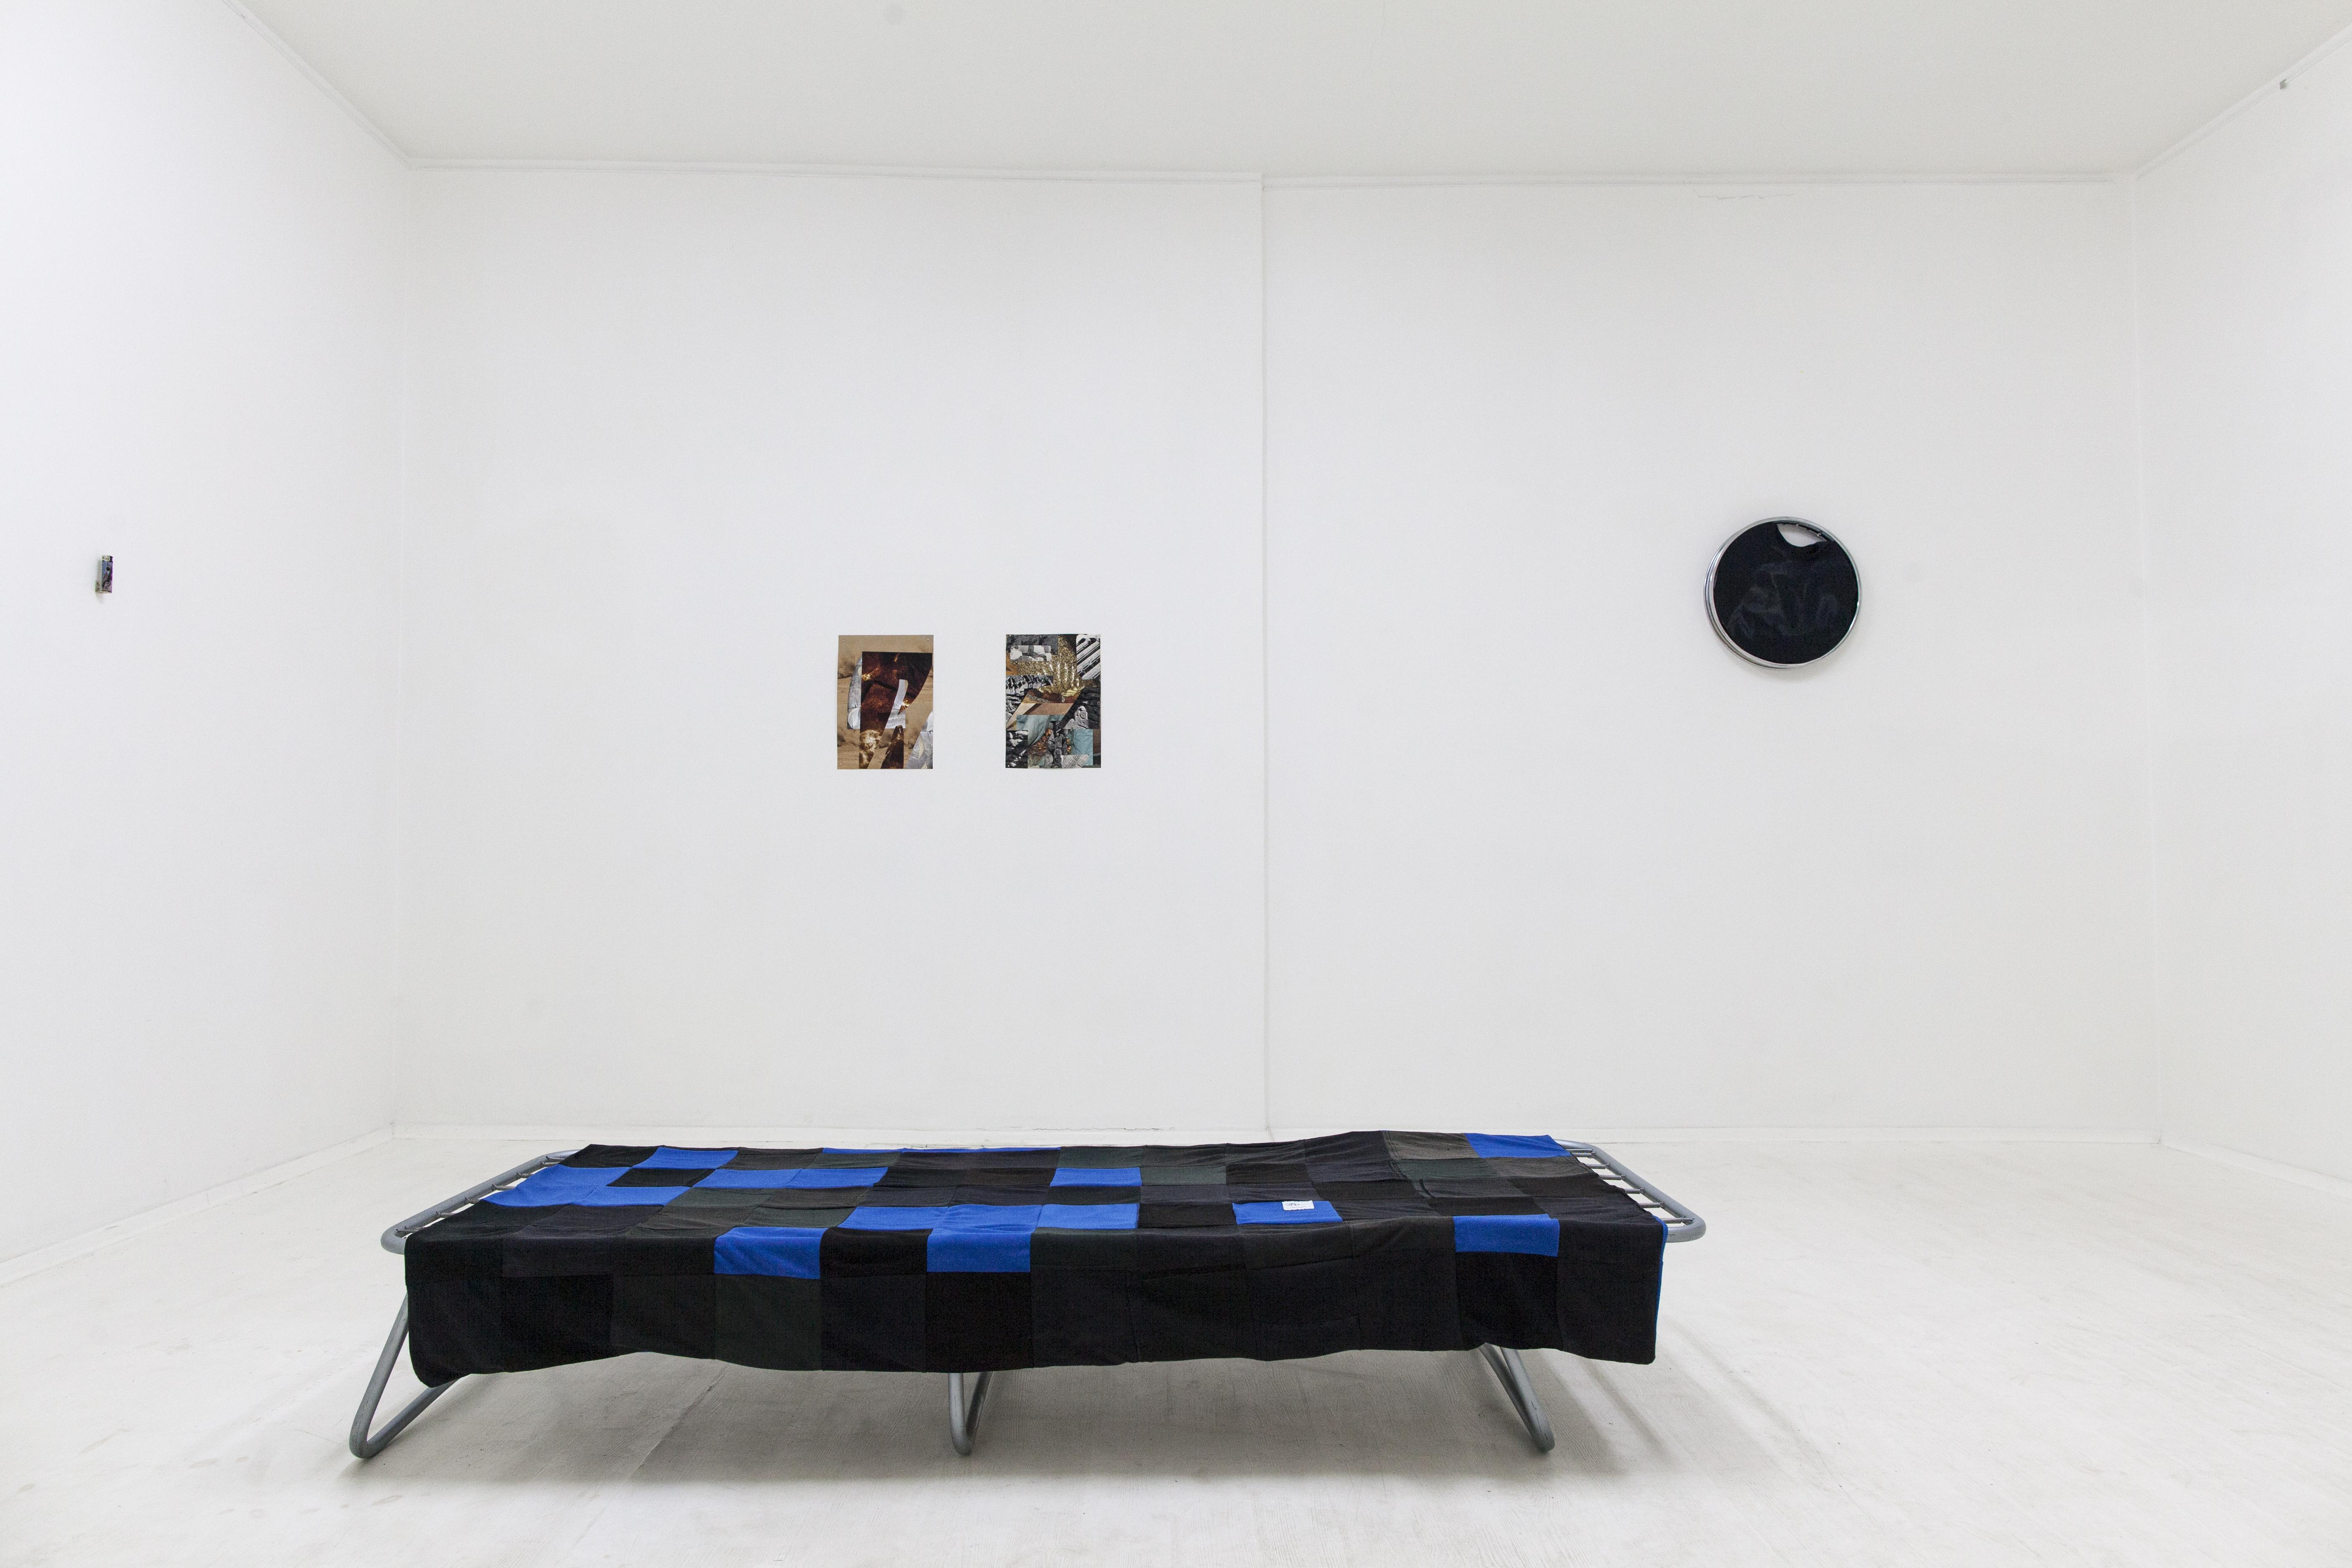 Anna Bąk, 9 minut, widok wystawy